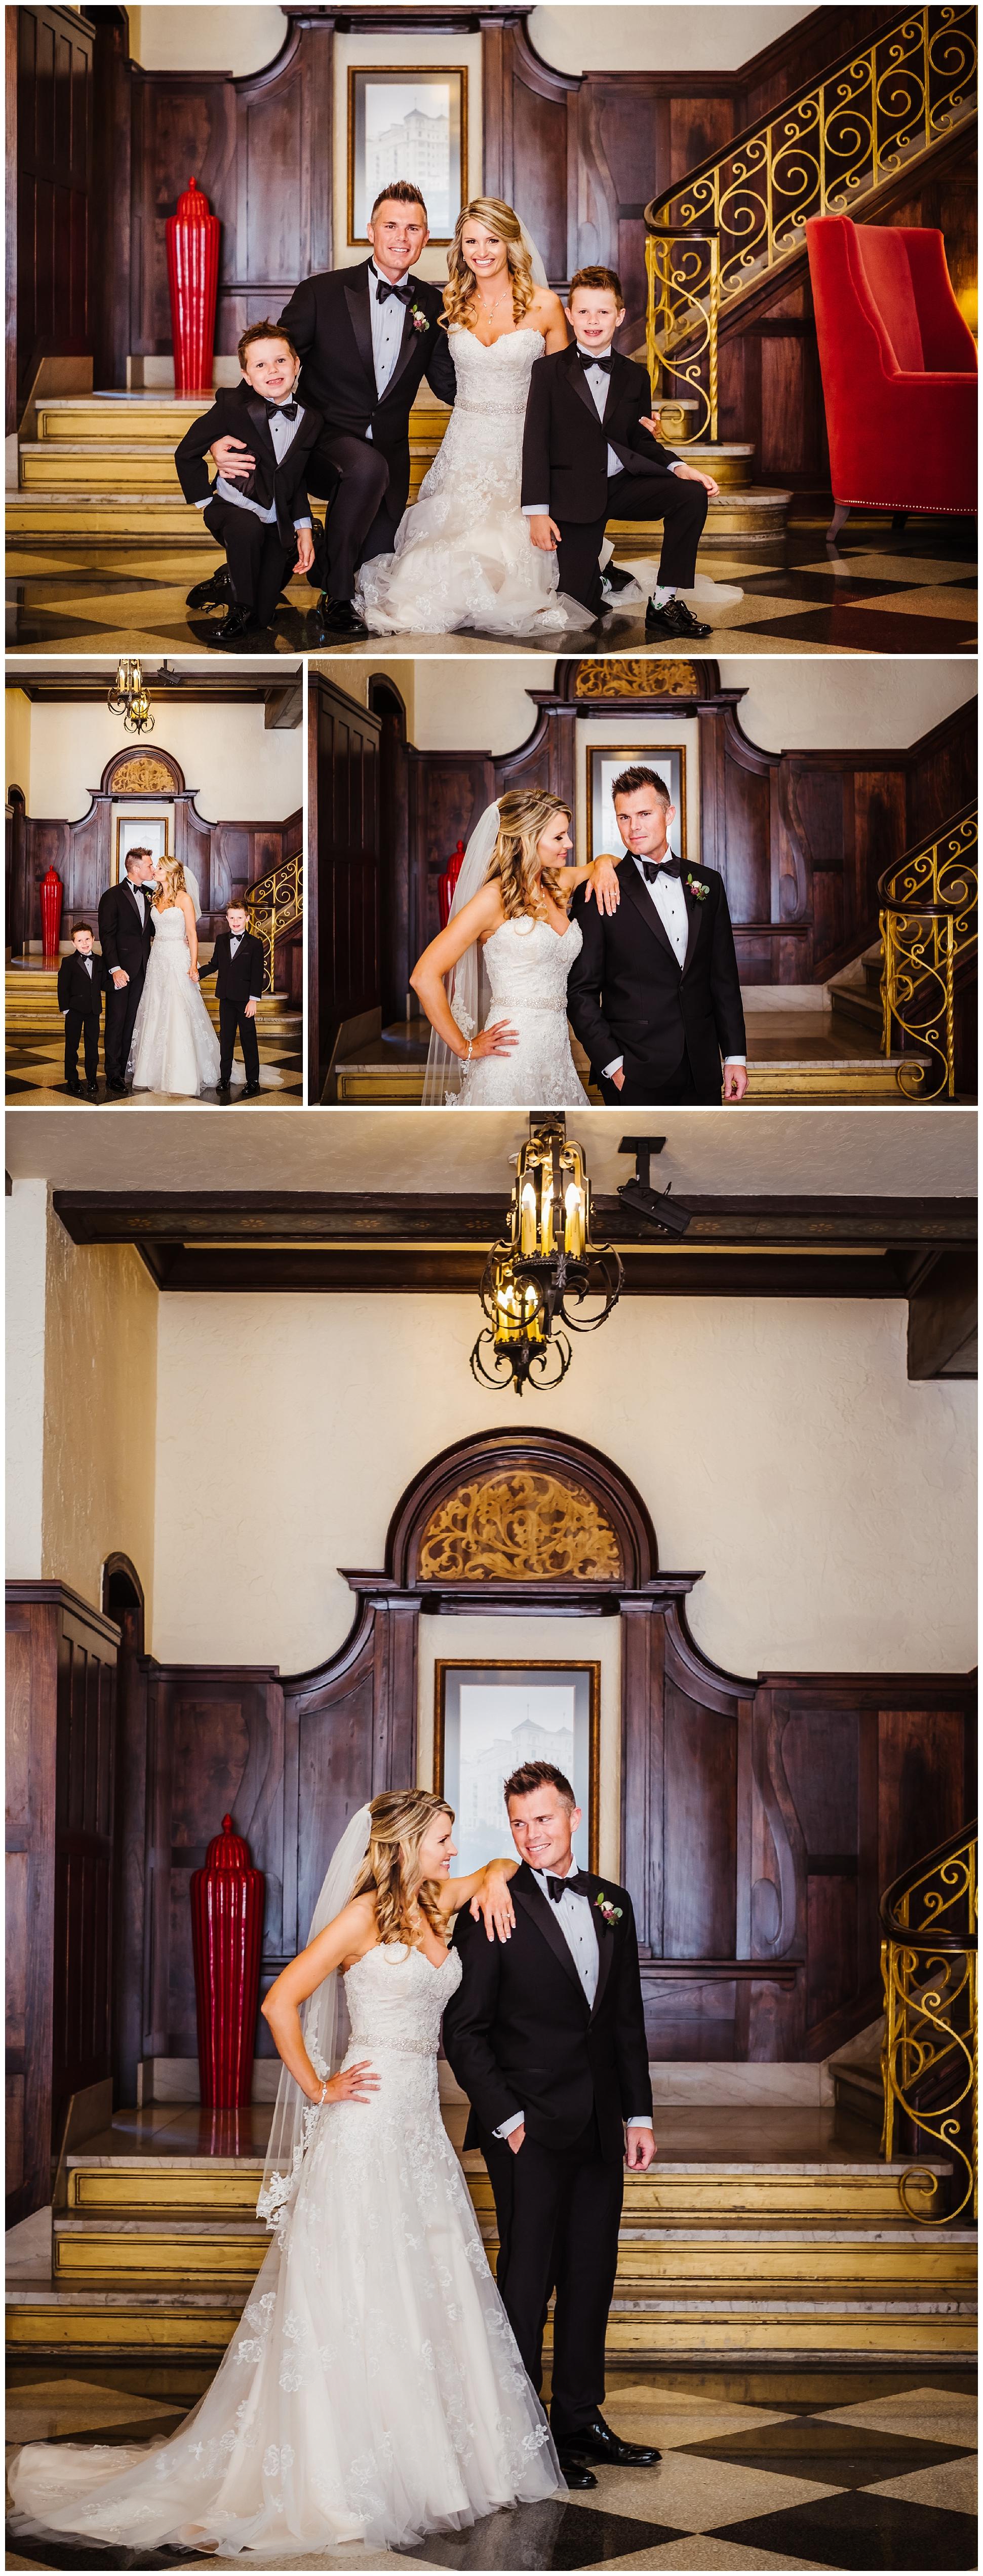 tampa-bradenton-wedding-photographer-south-florida-museum-classic-blush-gold-alpacas-sparklers_0026.jpg